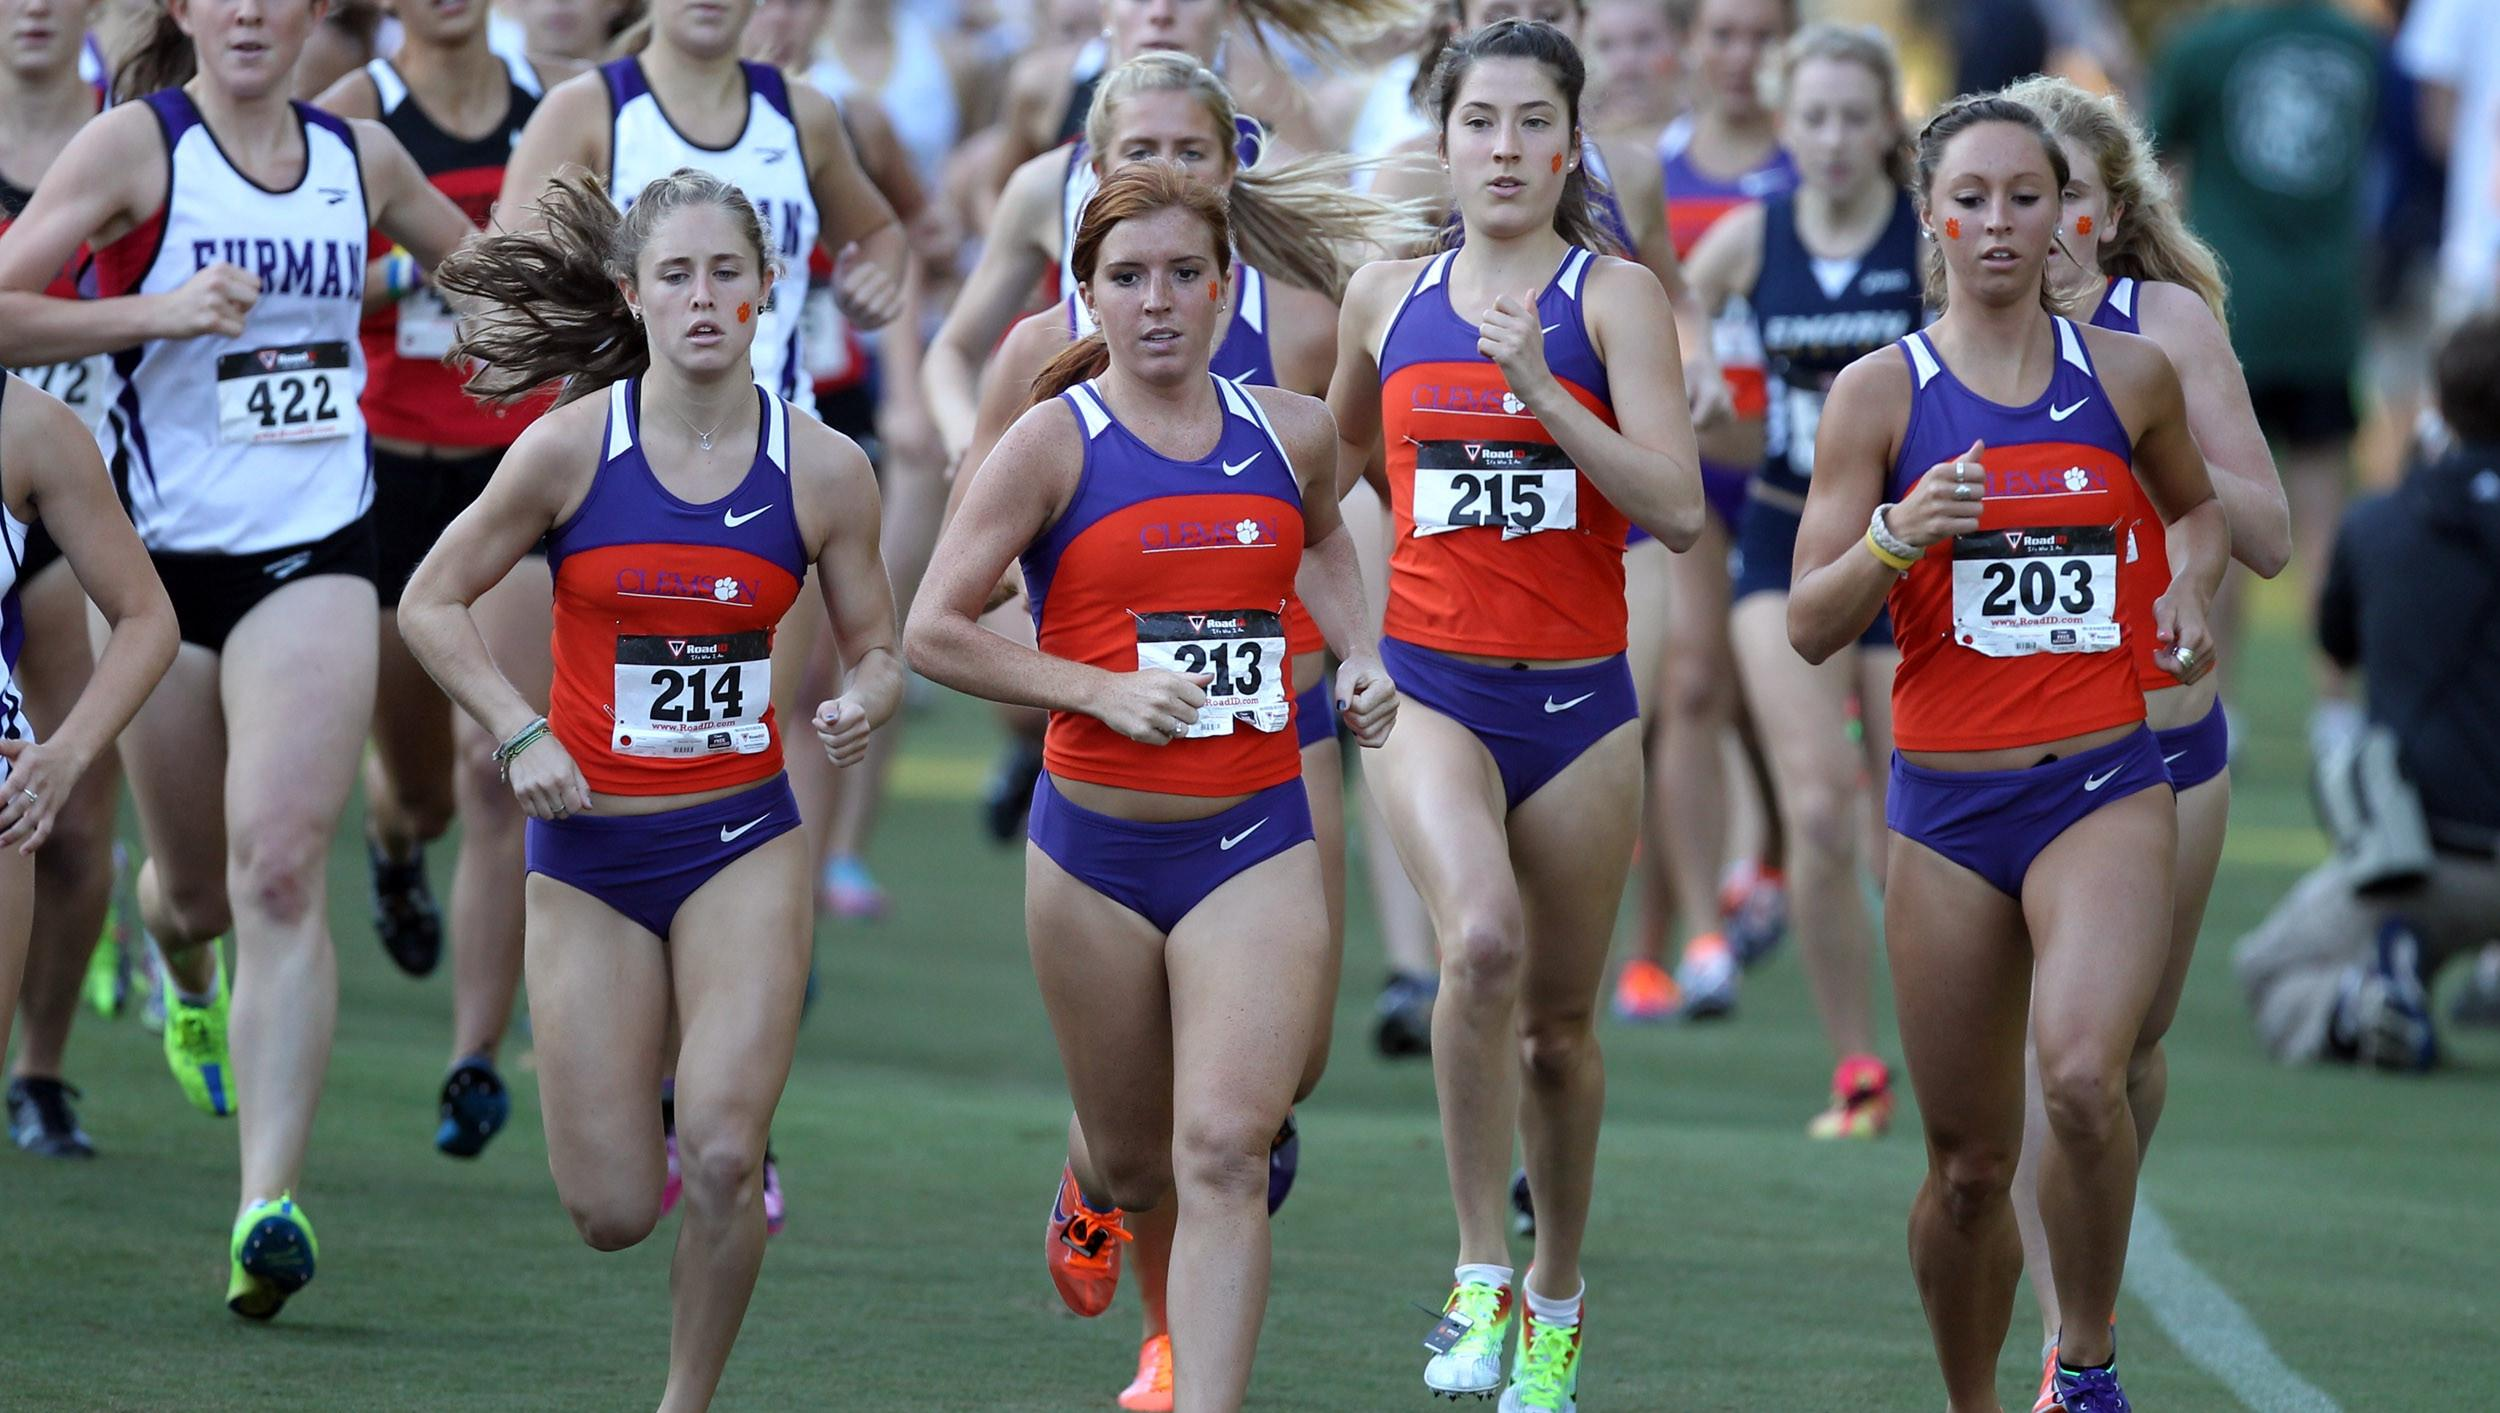 Clemson Women Open Season with Runner-Up Finish at Furman Classic